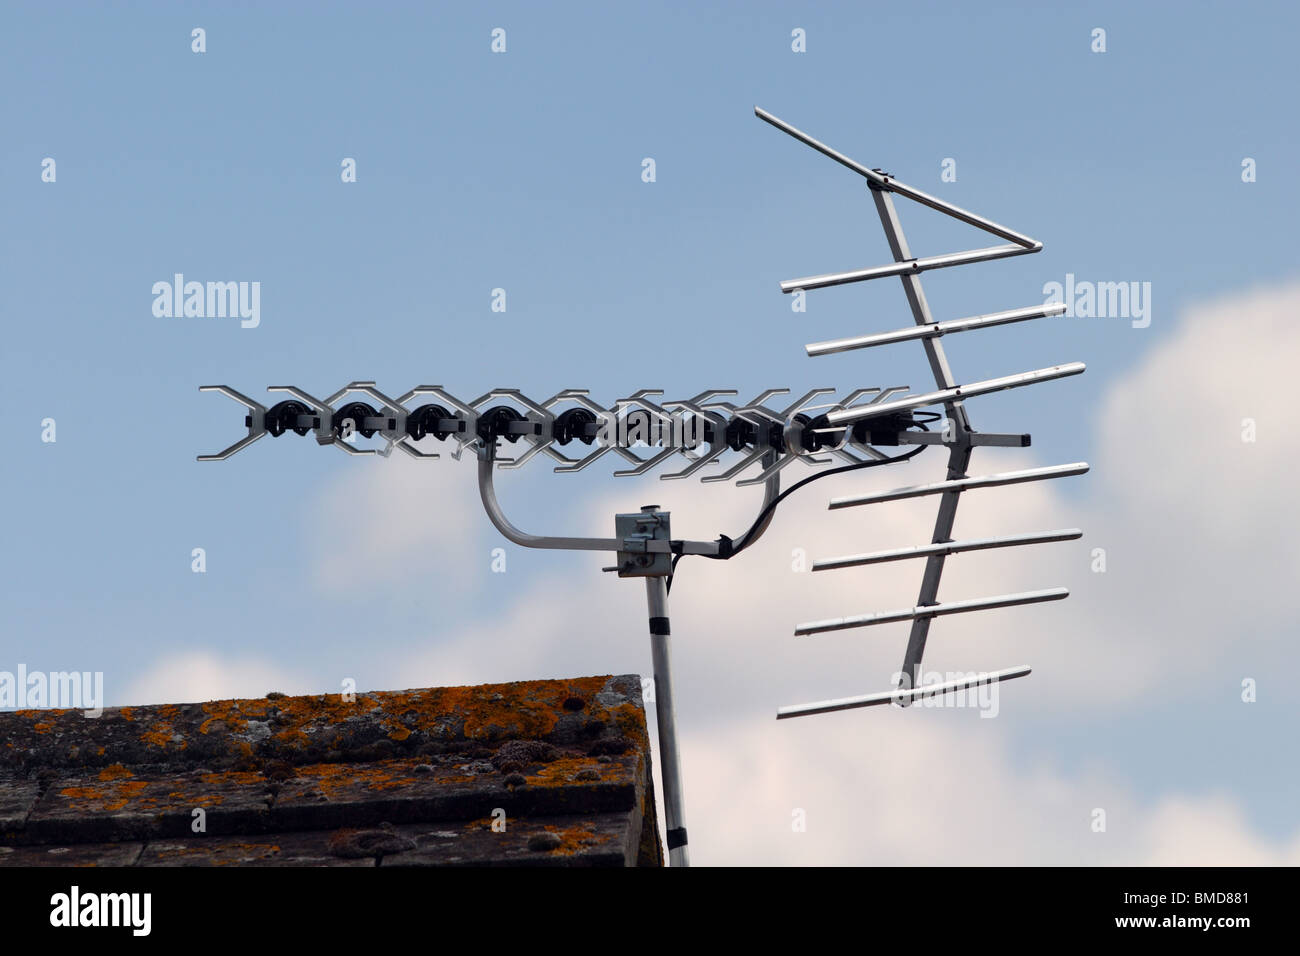 Freeview Digital TV Aerial in UK - Stock Image